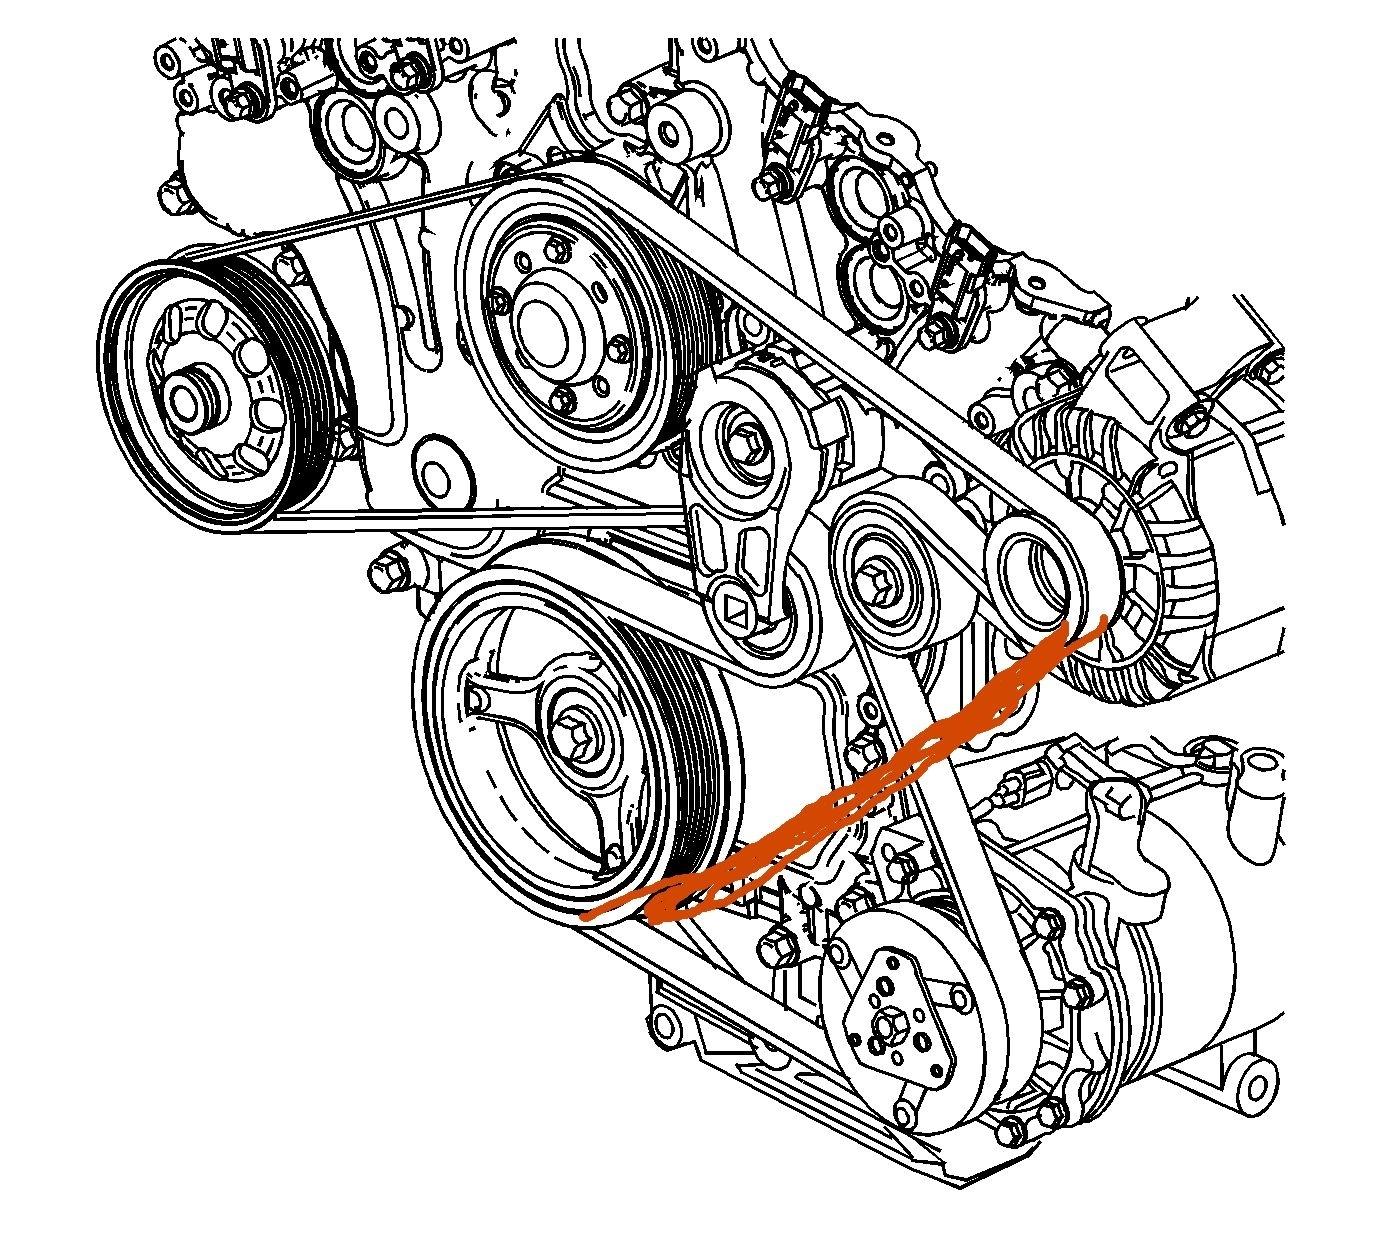 MC_7231] Grand Am 3400 Motor Diagram On 2005 Buick Lacrosse Cxl Engine  Diagram Free DiagramTacle Xolia Mohammedshrine Librar Wiring 101